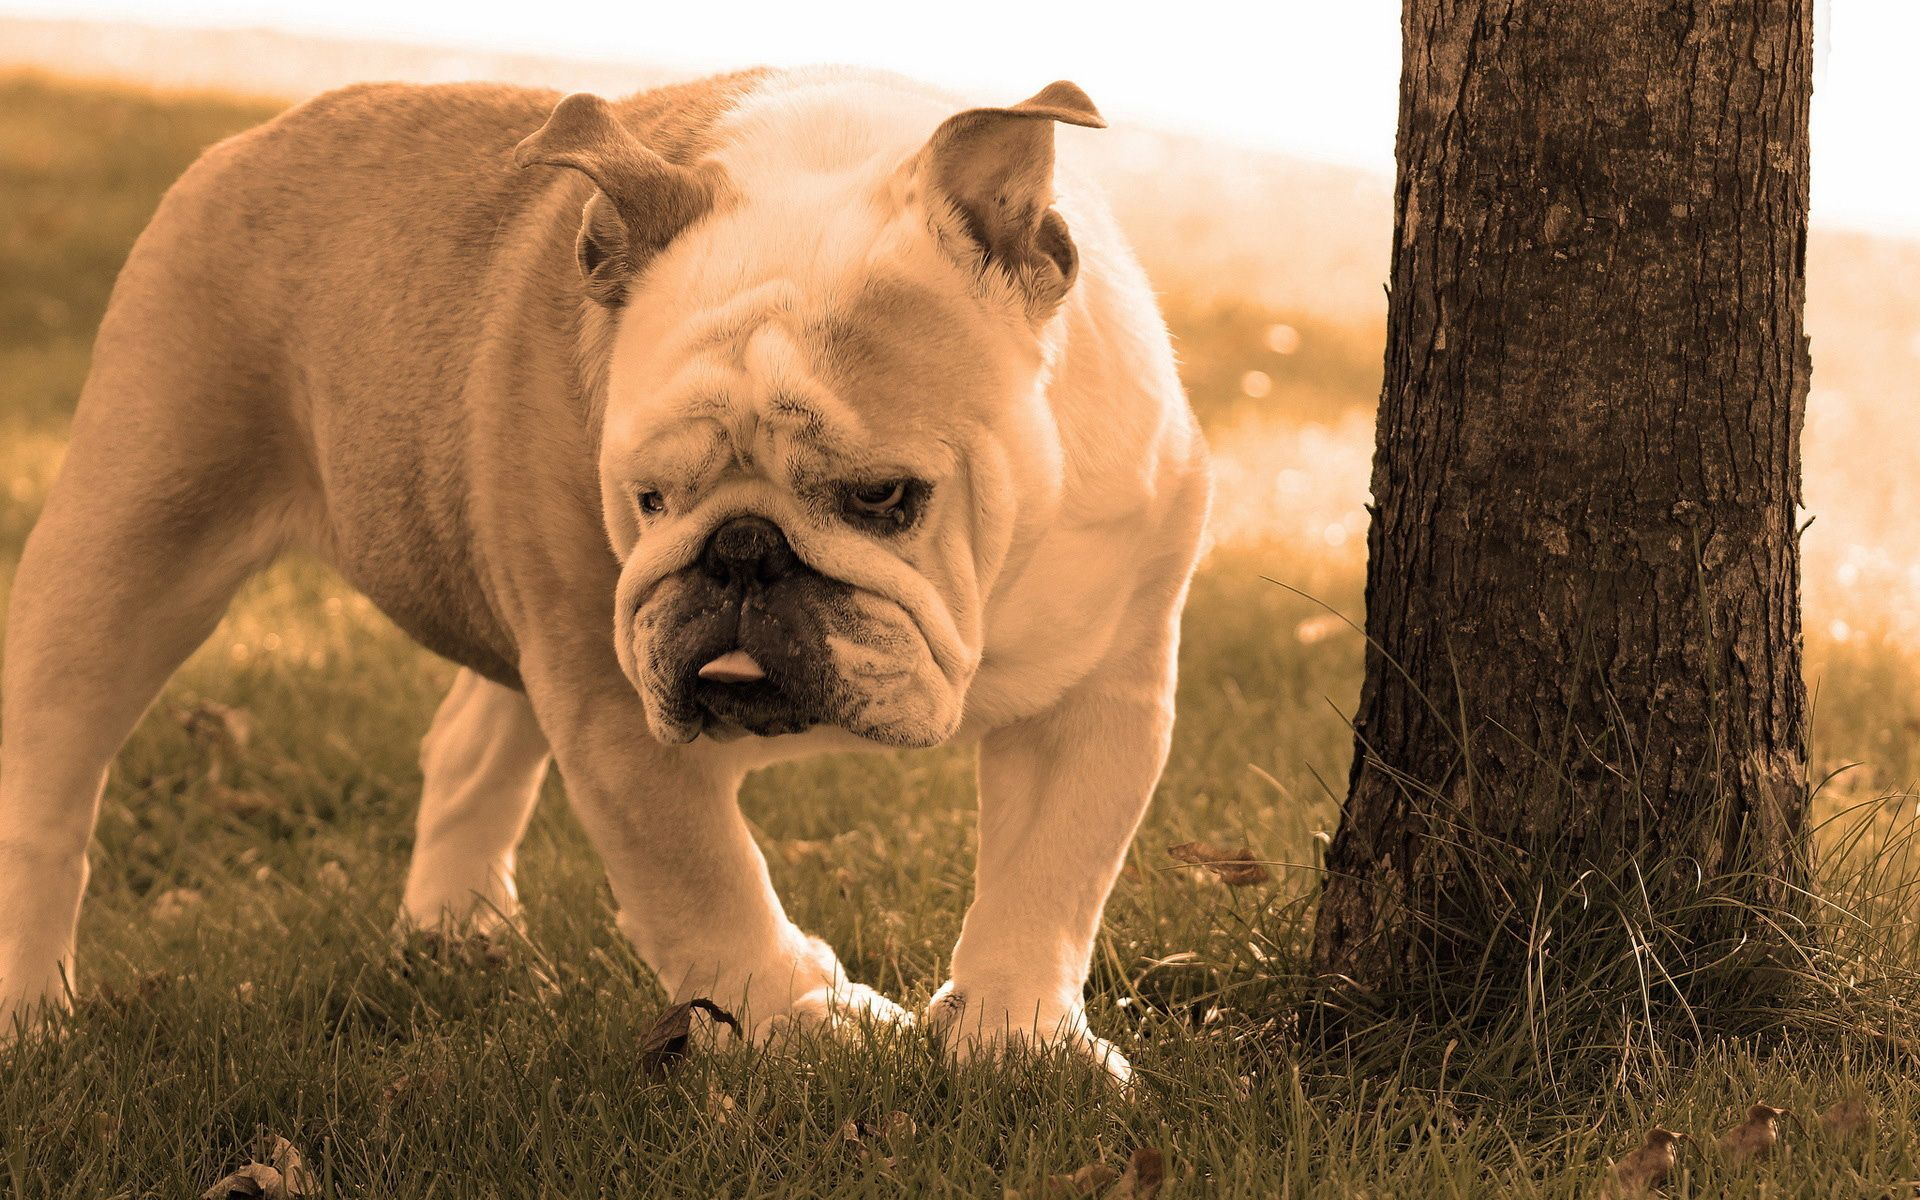 Bulldog Hd Wallpaper Free Hd Wallpapers Bulldog Dog Images Pet Birds